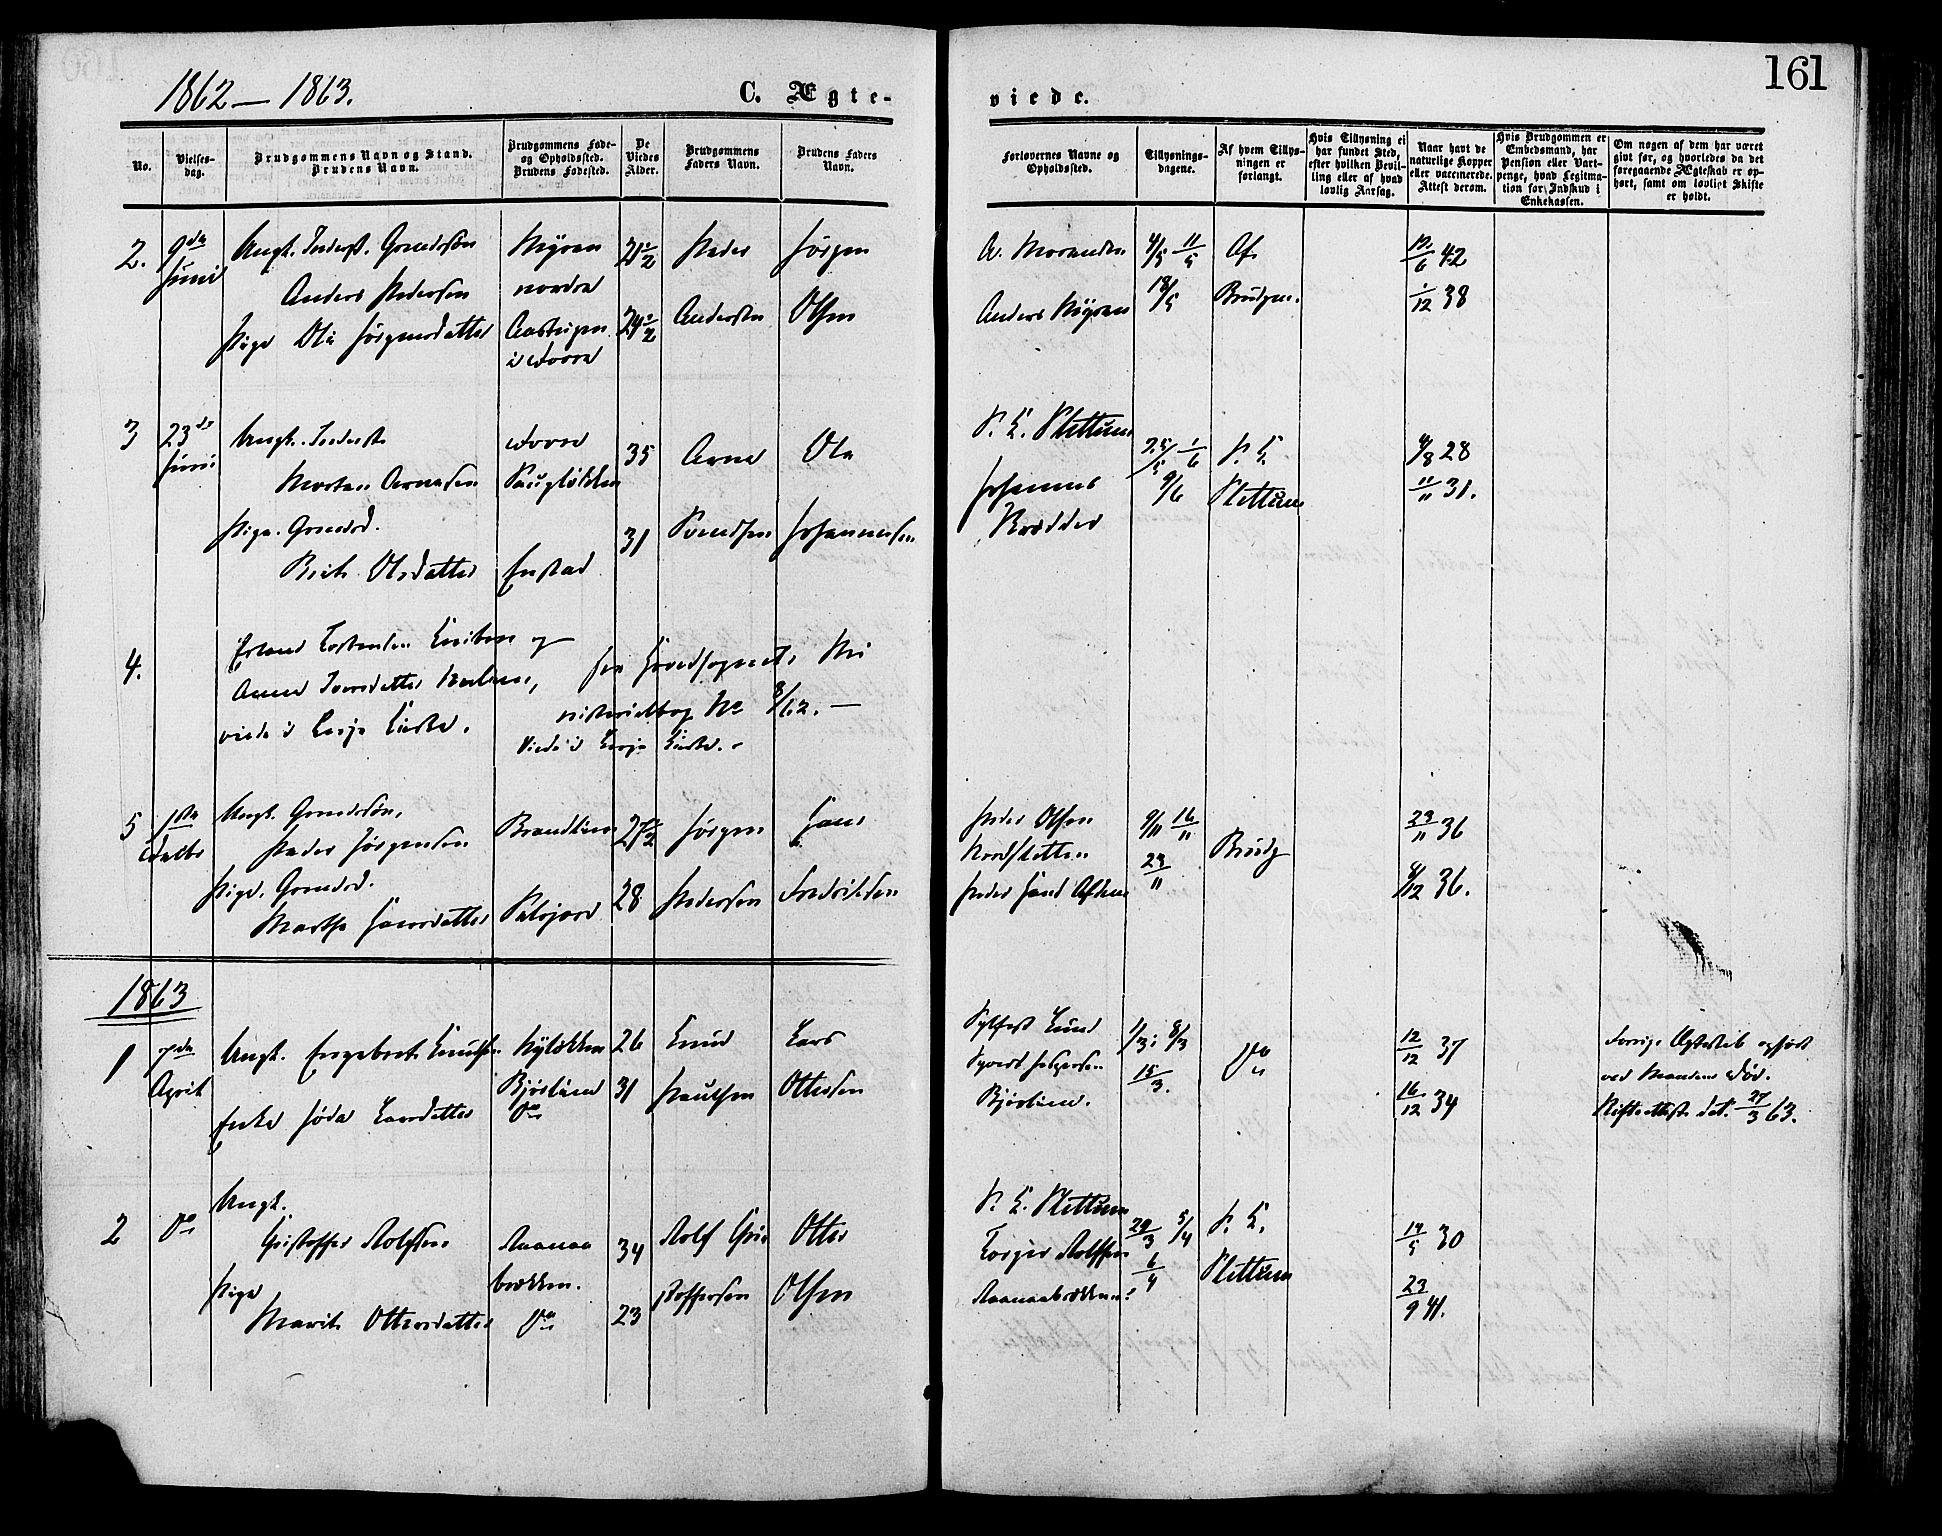 SAH, Lesja prestekontor, Ministerialbok nr. 9, 1854-1889, s. 161